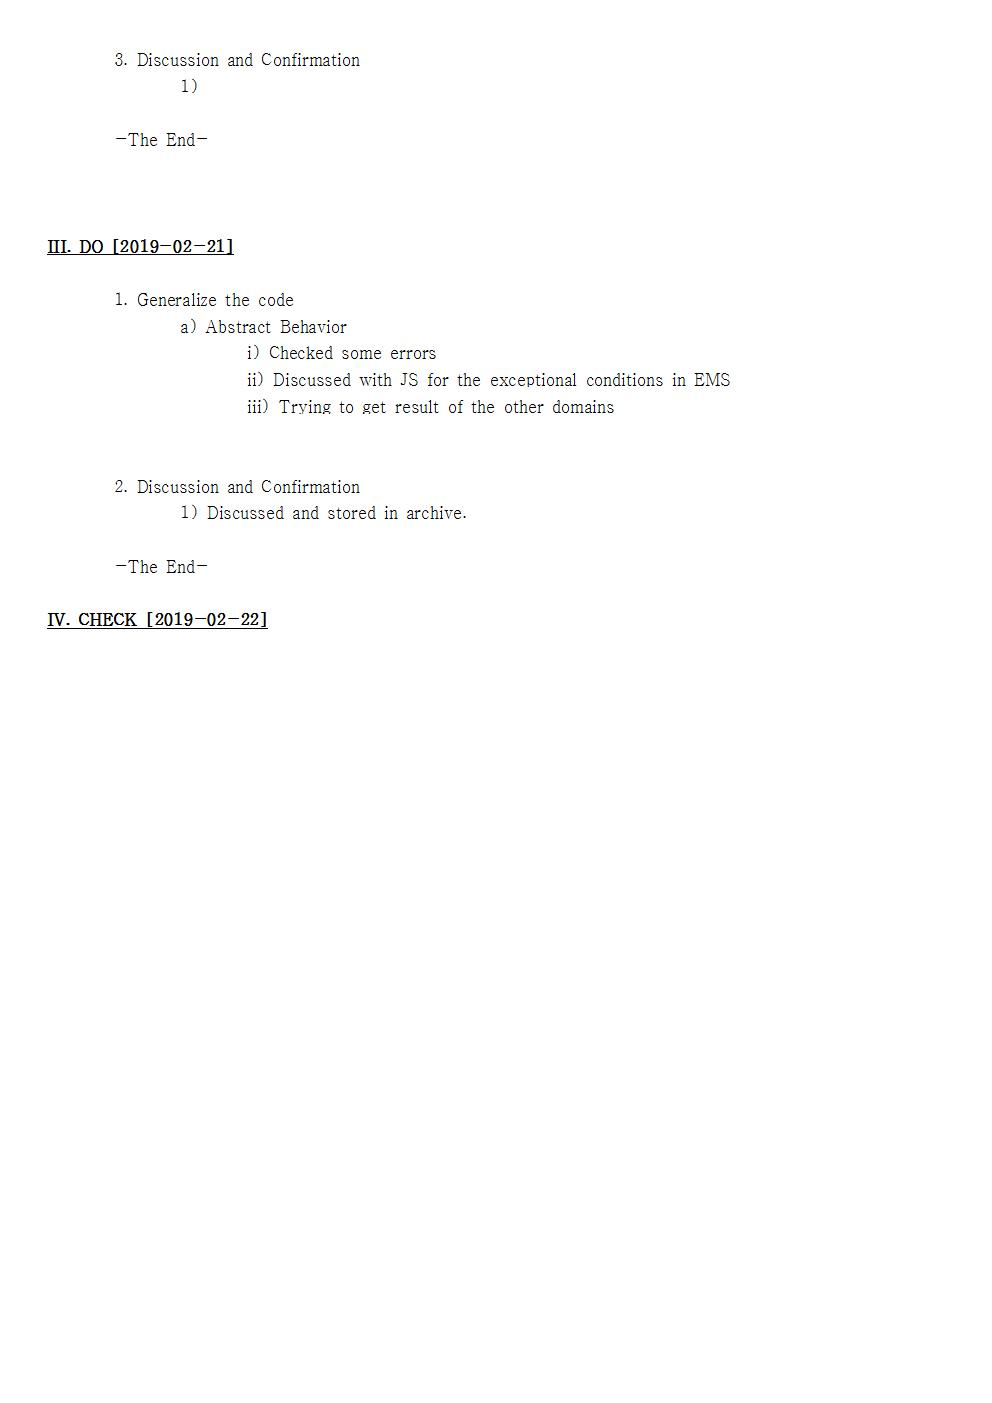 D-[19-002-RD-02]-[PRISM2.0-ADOxx]-[2019-02-21]-[MR]002.jpg